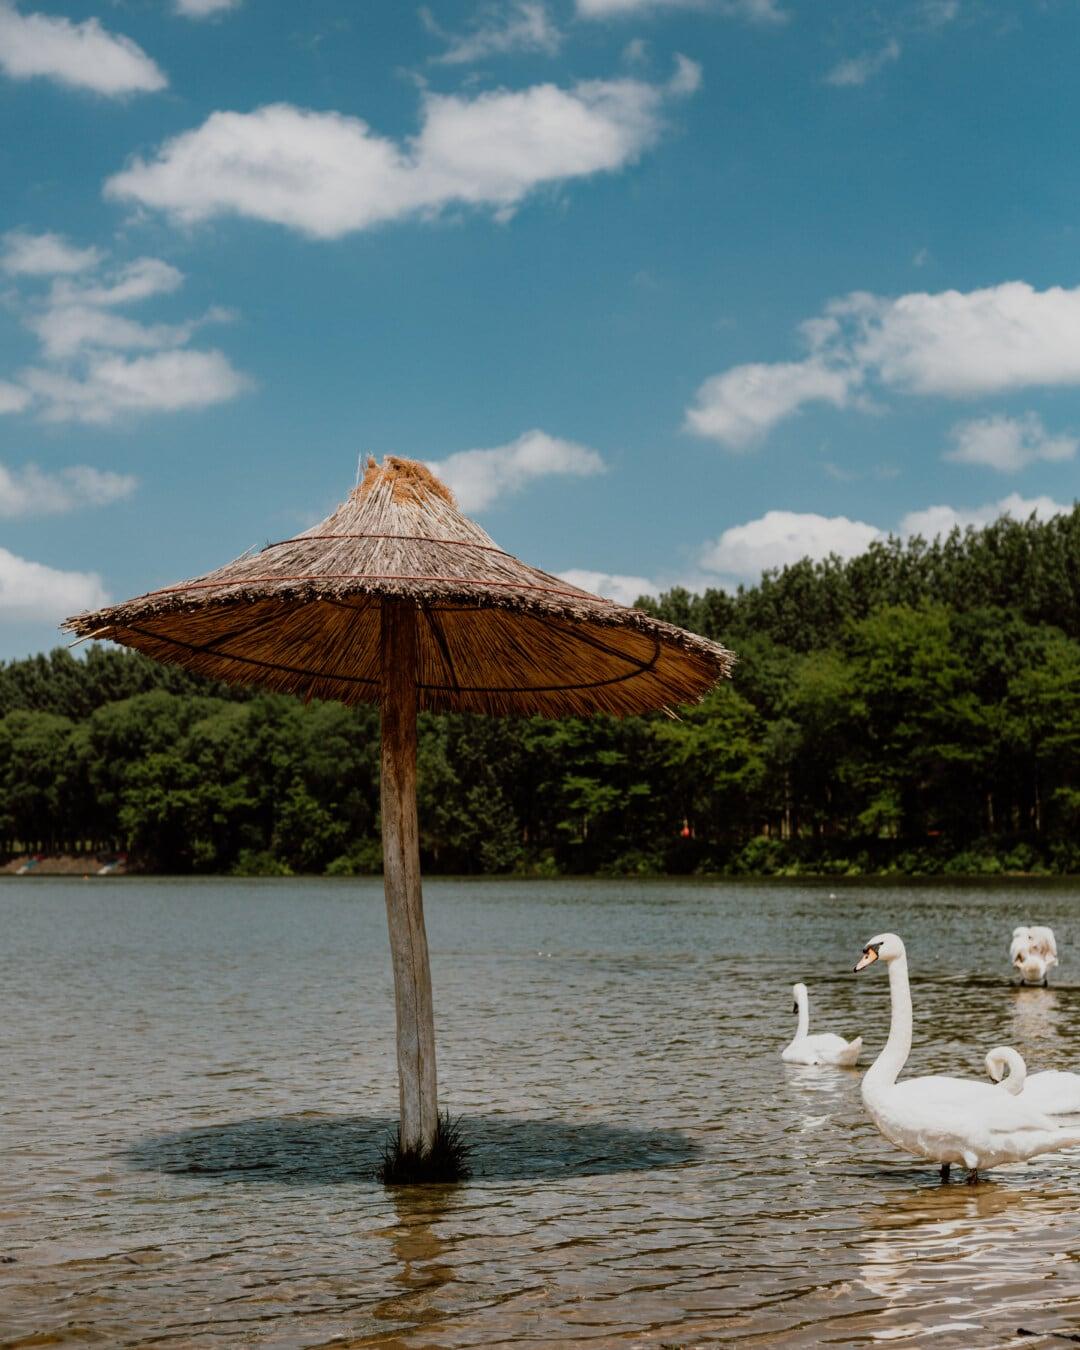 beach, floodplain, parasol, birds, swan, tropical, resort, water, sea, vacation